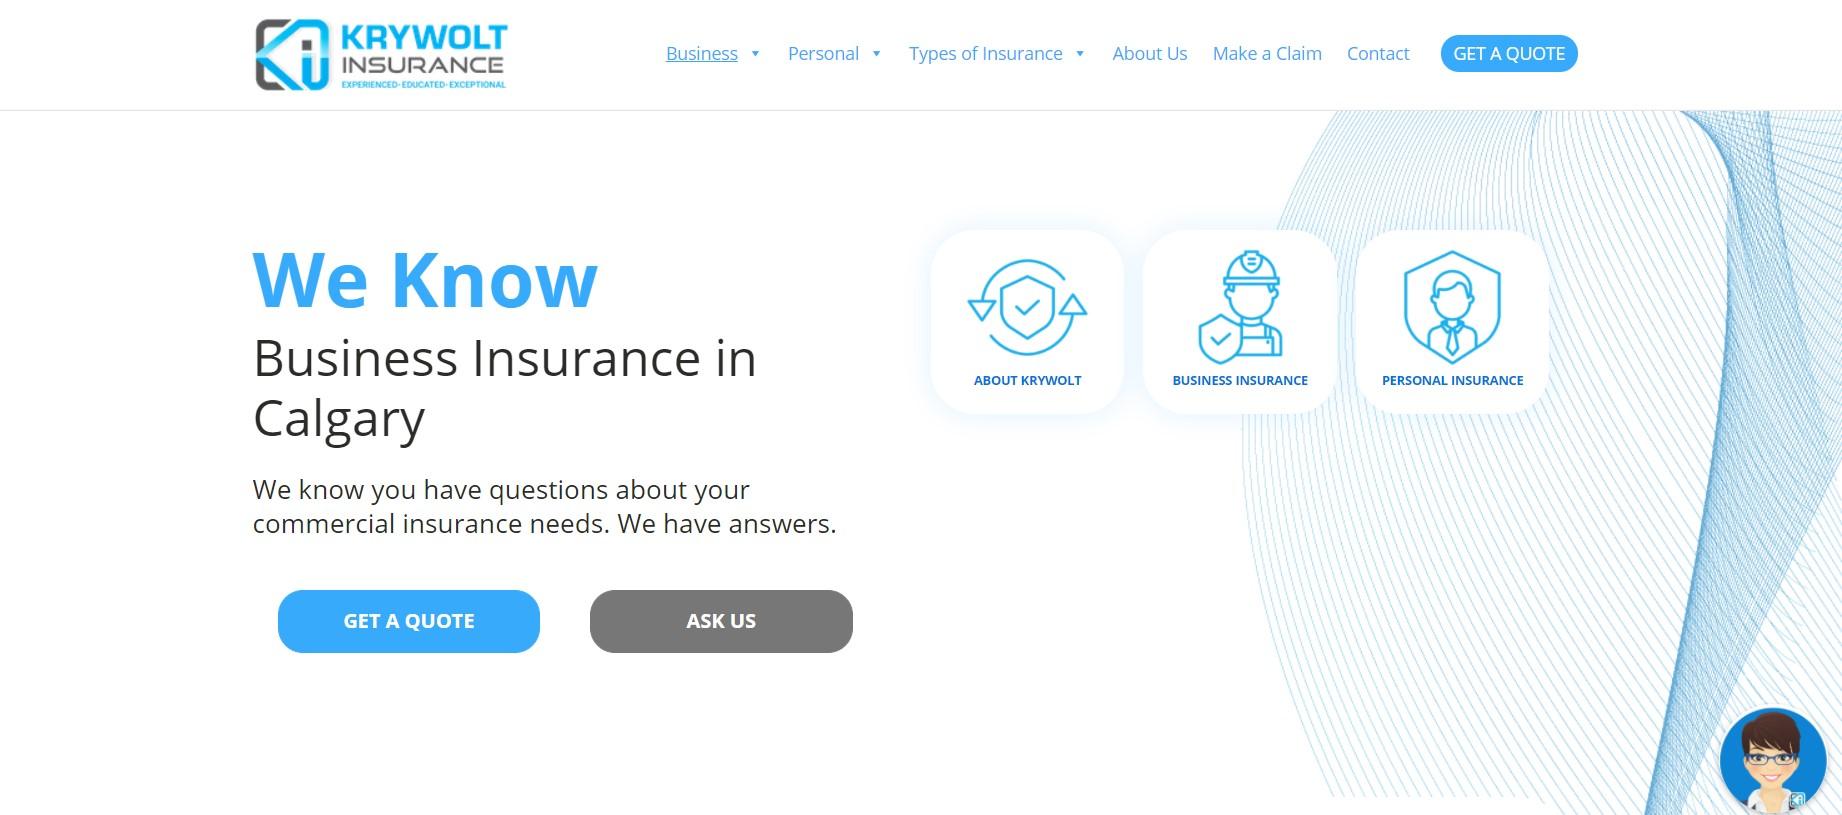 krywolt insurance broker in calgary